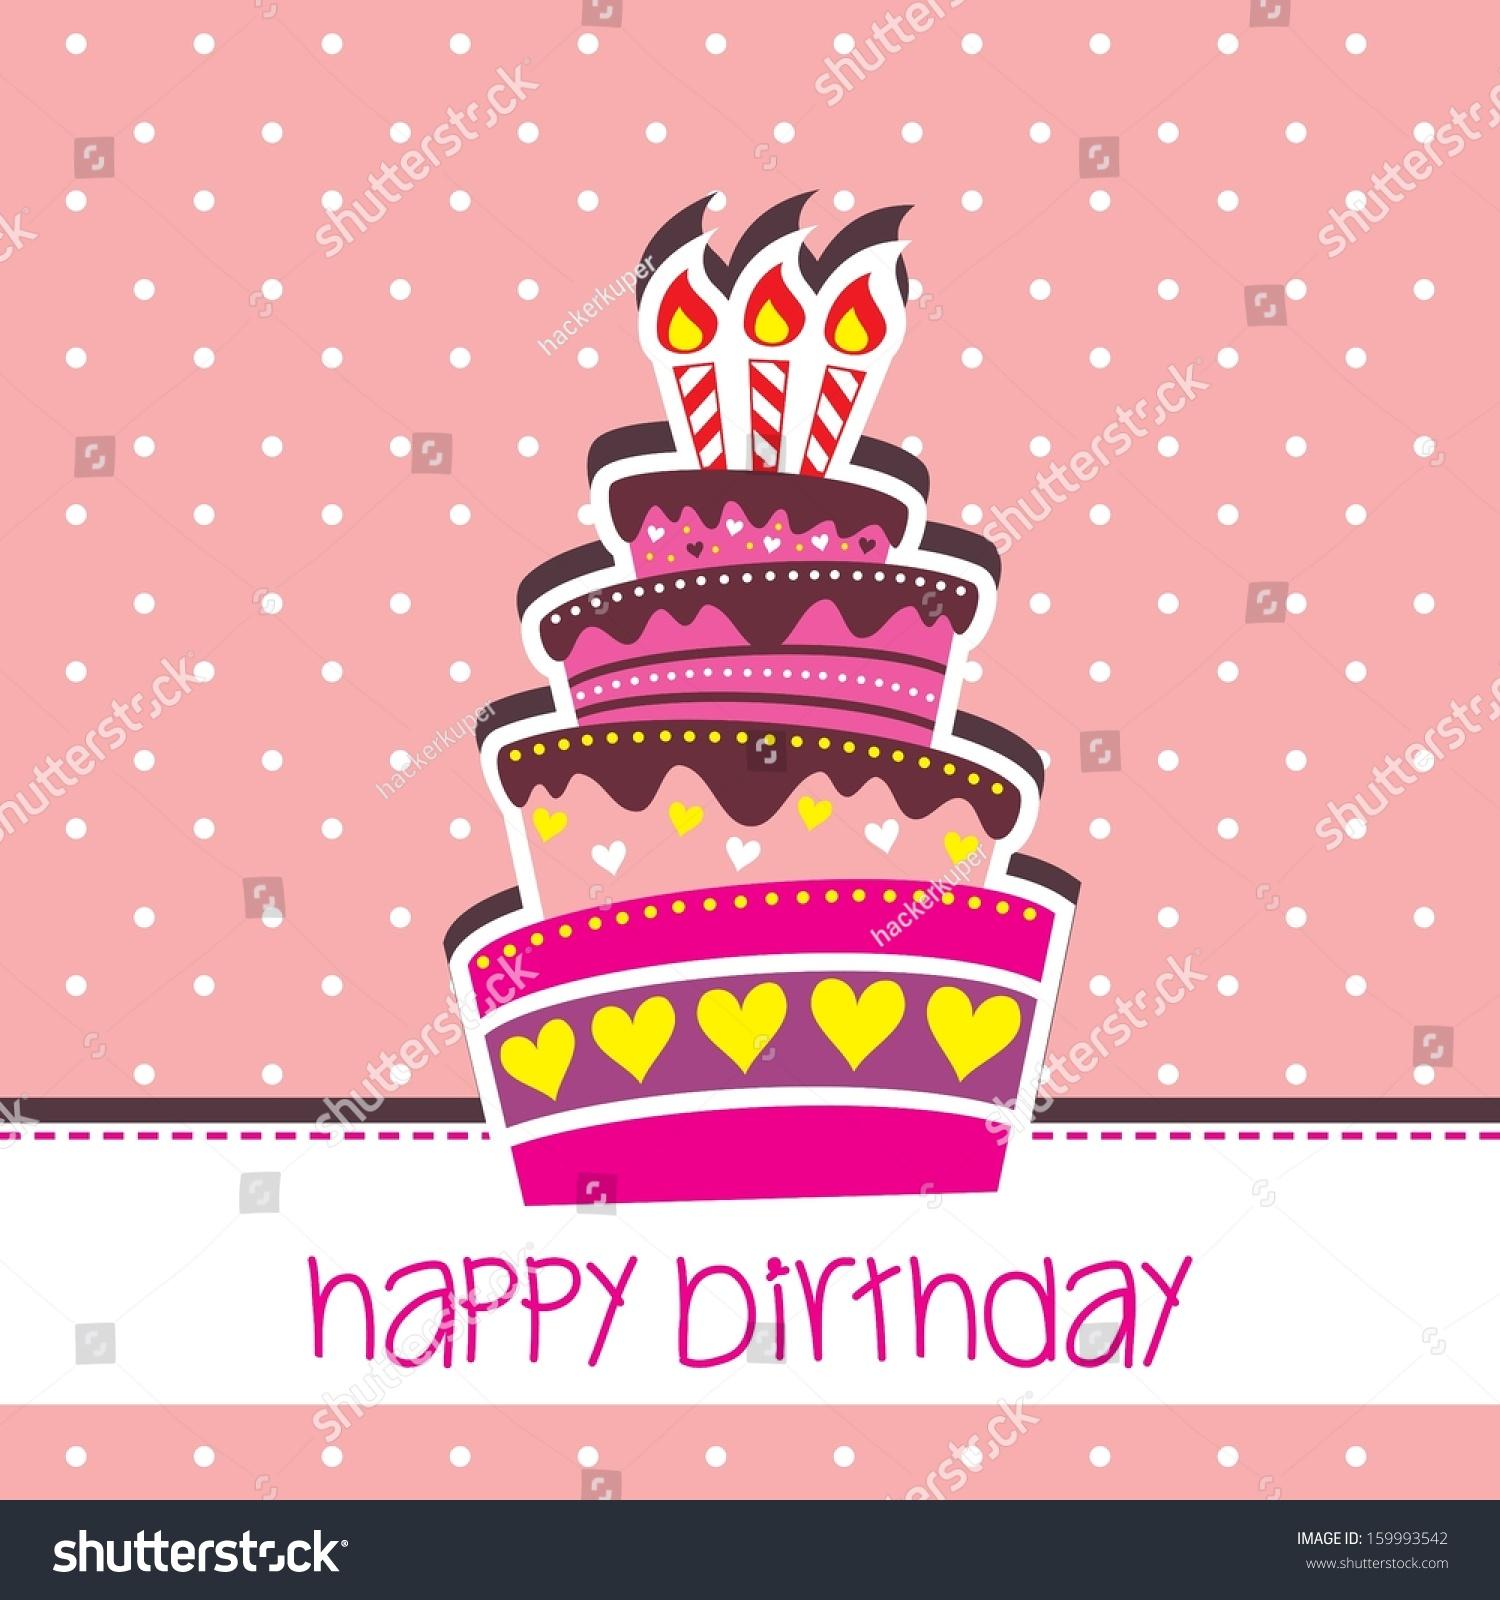 Delightful Happy Birthday Cake Card Vector Pink Stock Vector 159993542   Shutterstock Design